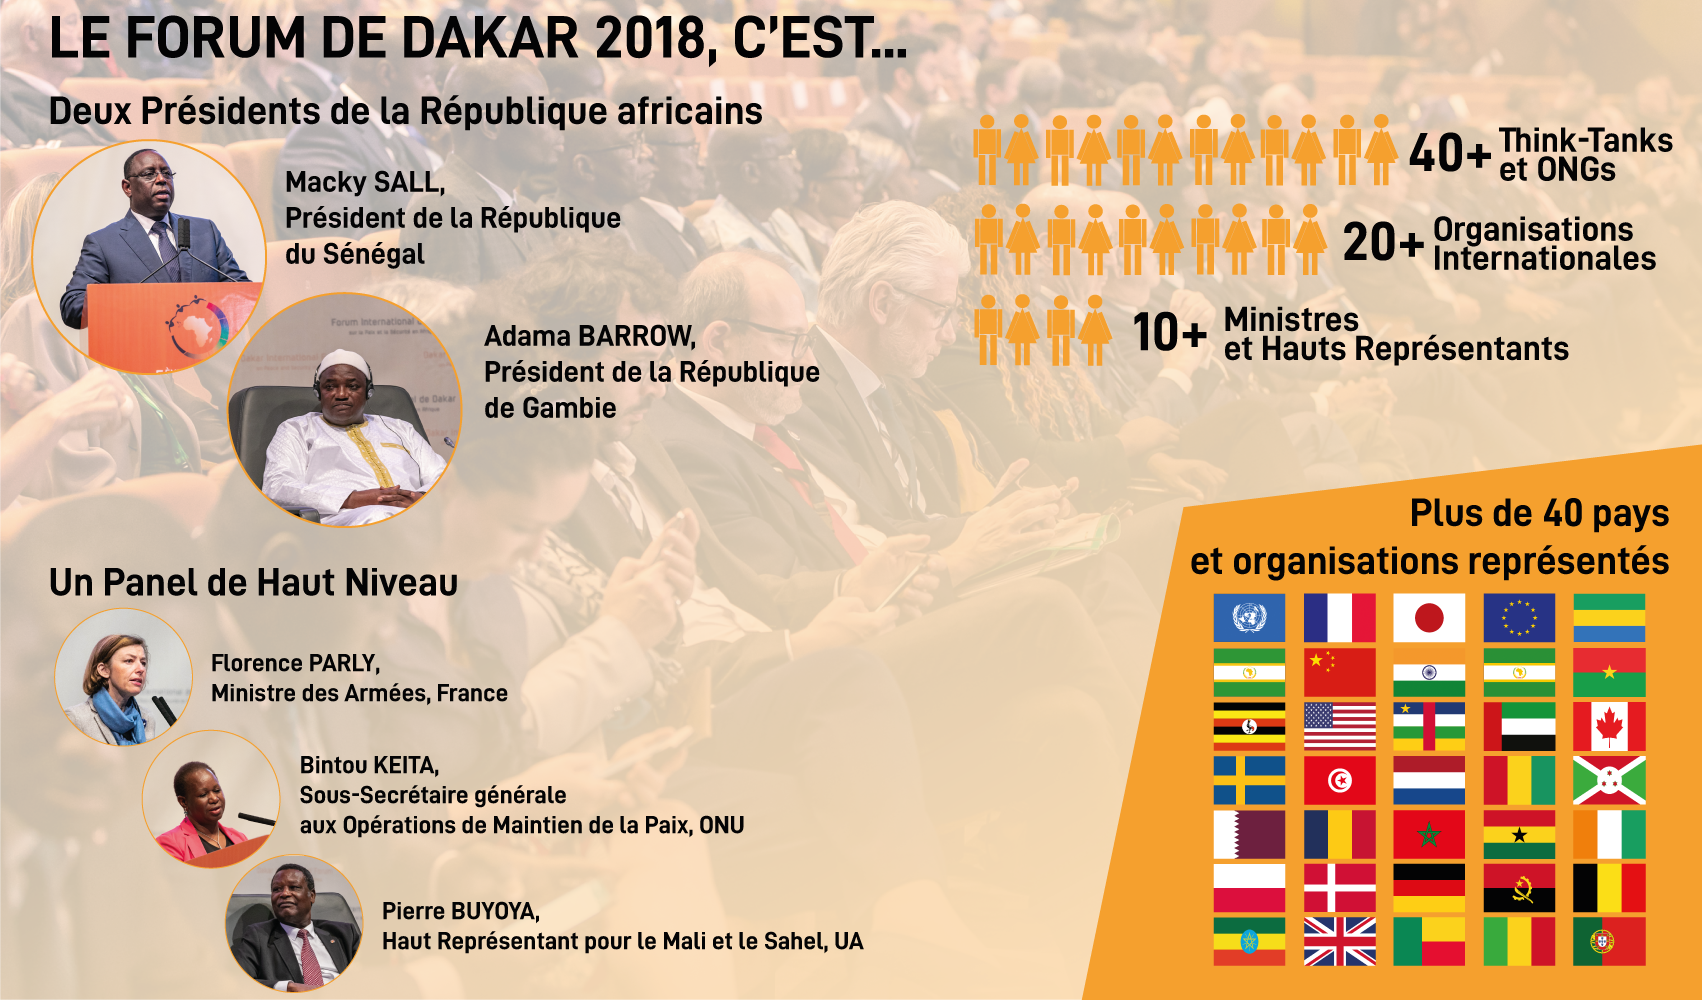 Forum International de Dakar 2018 en chiffres